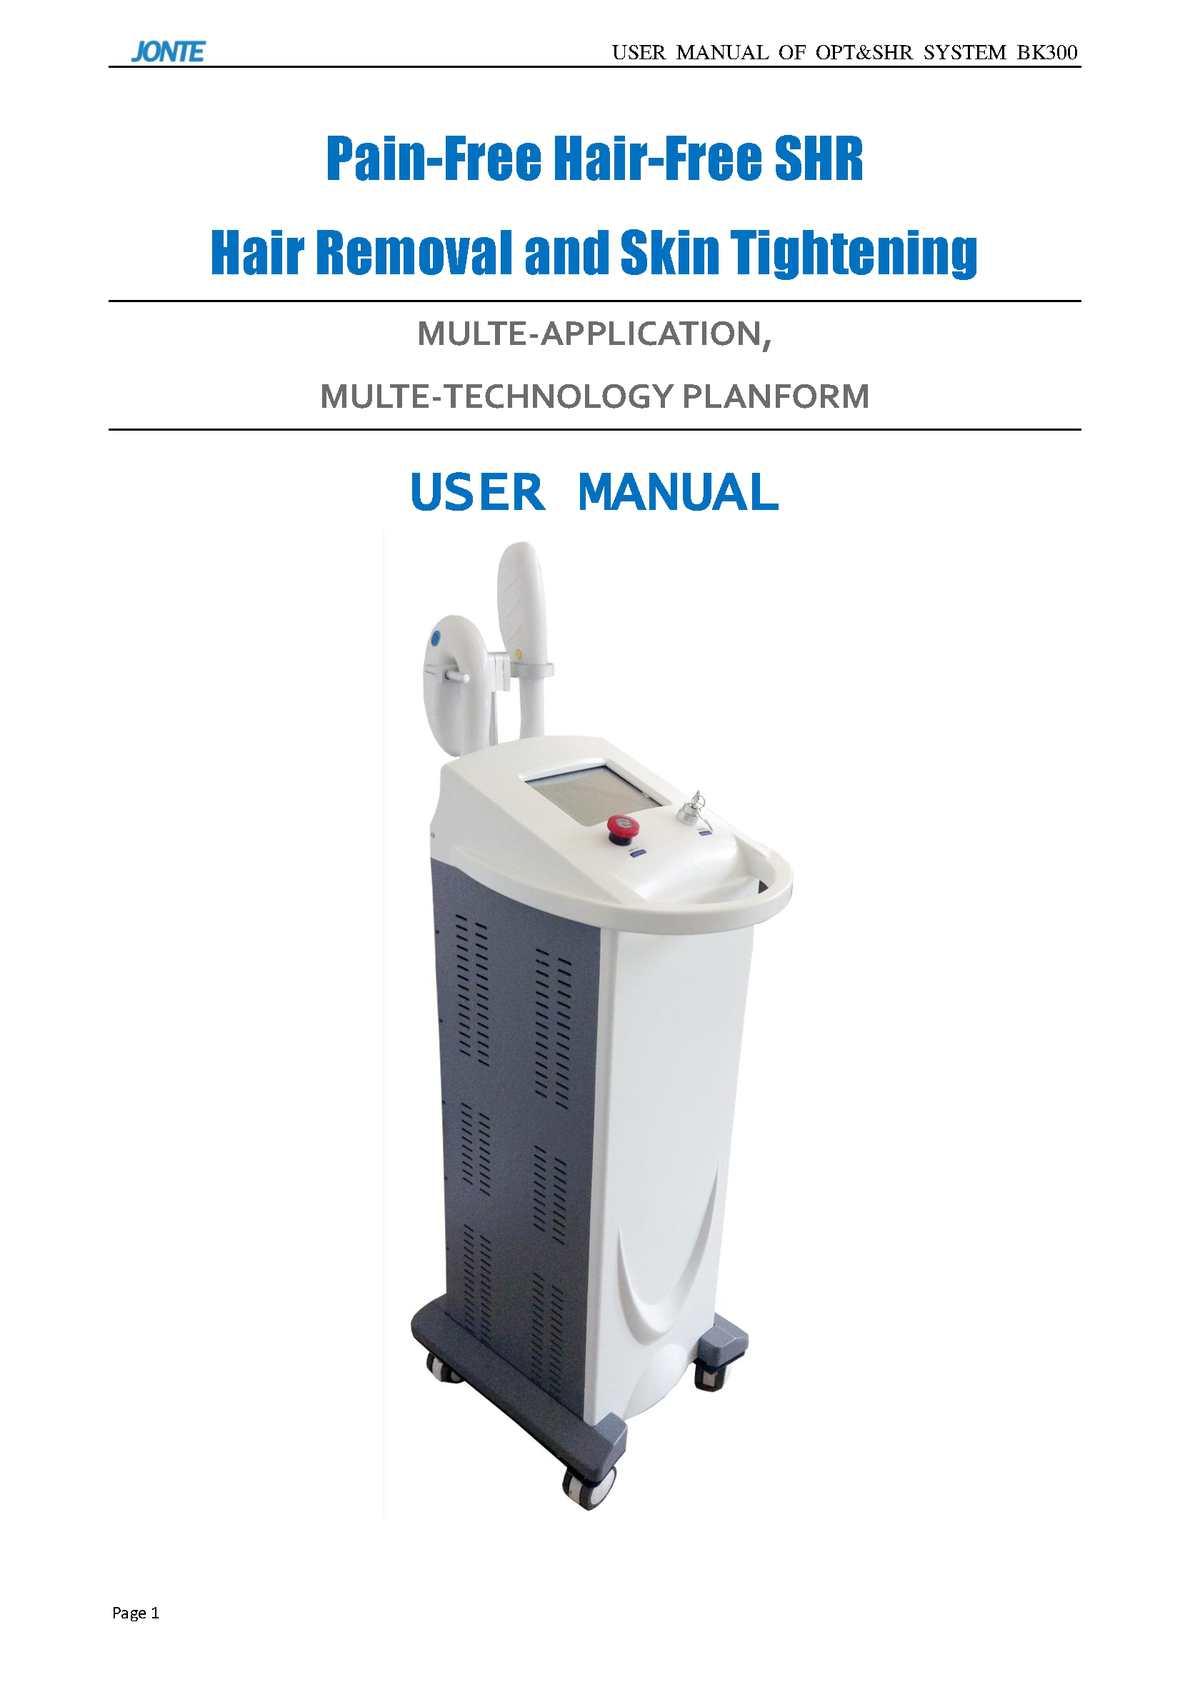 BK300 User Manual JONTE LASER